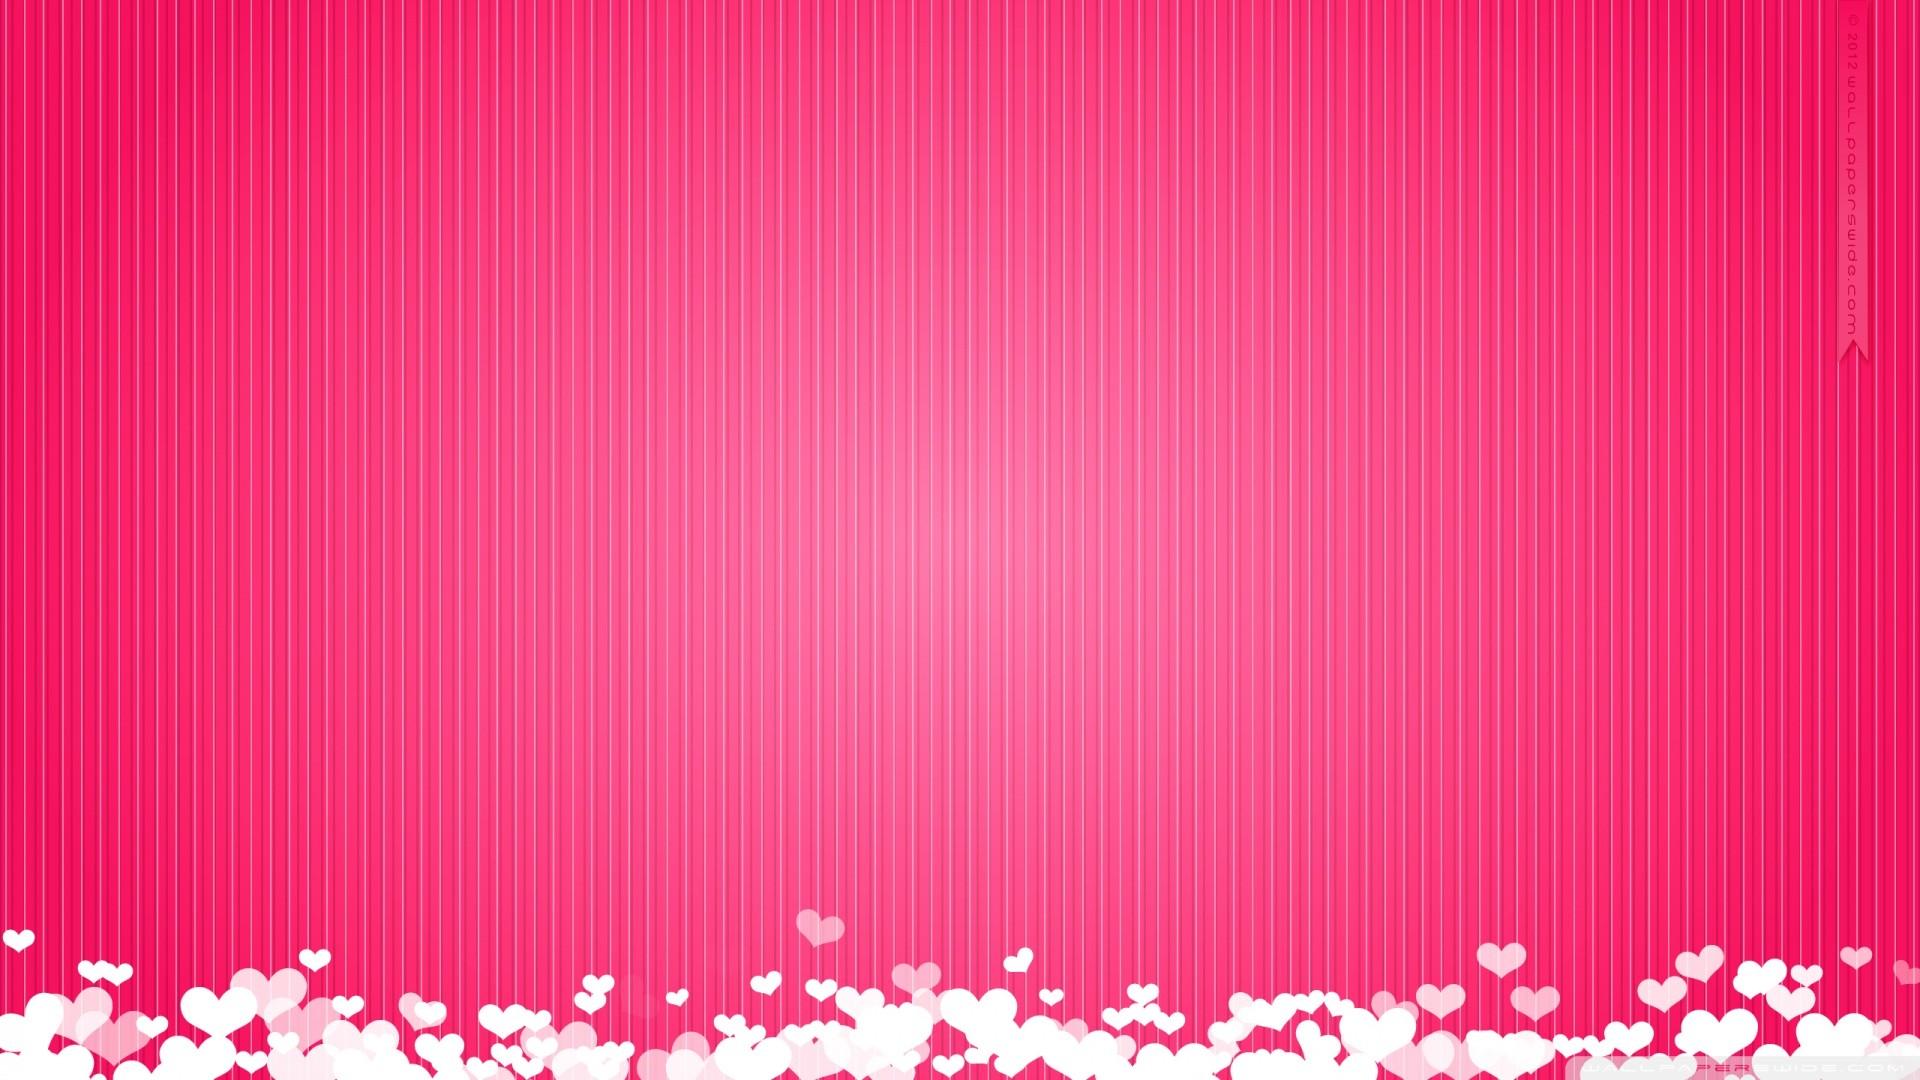 Pink Hd Wallpaper 81 Images